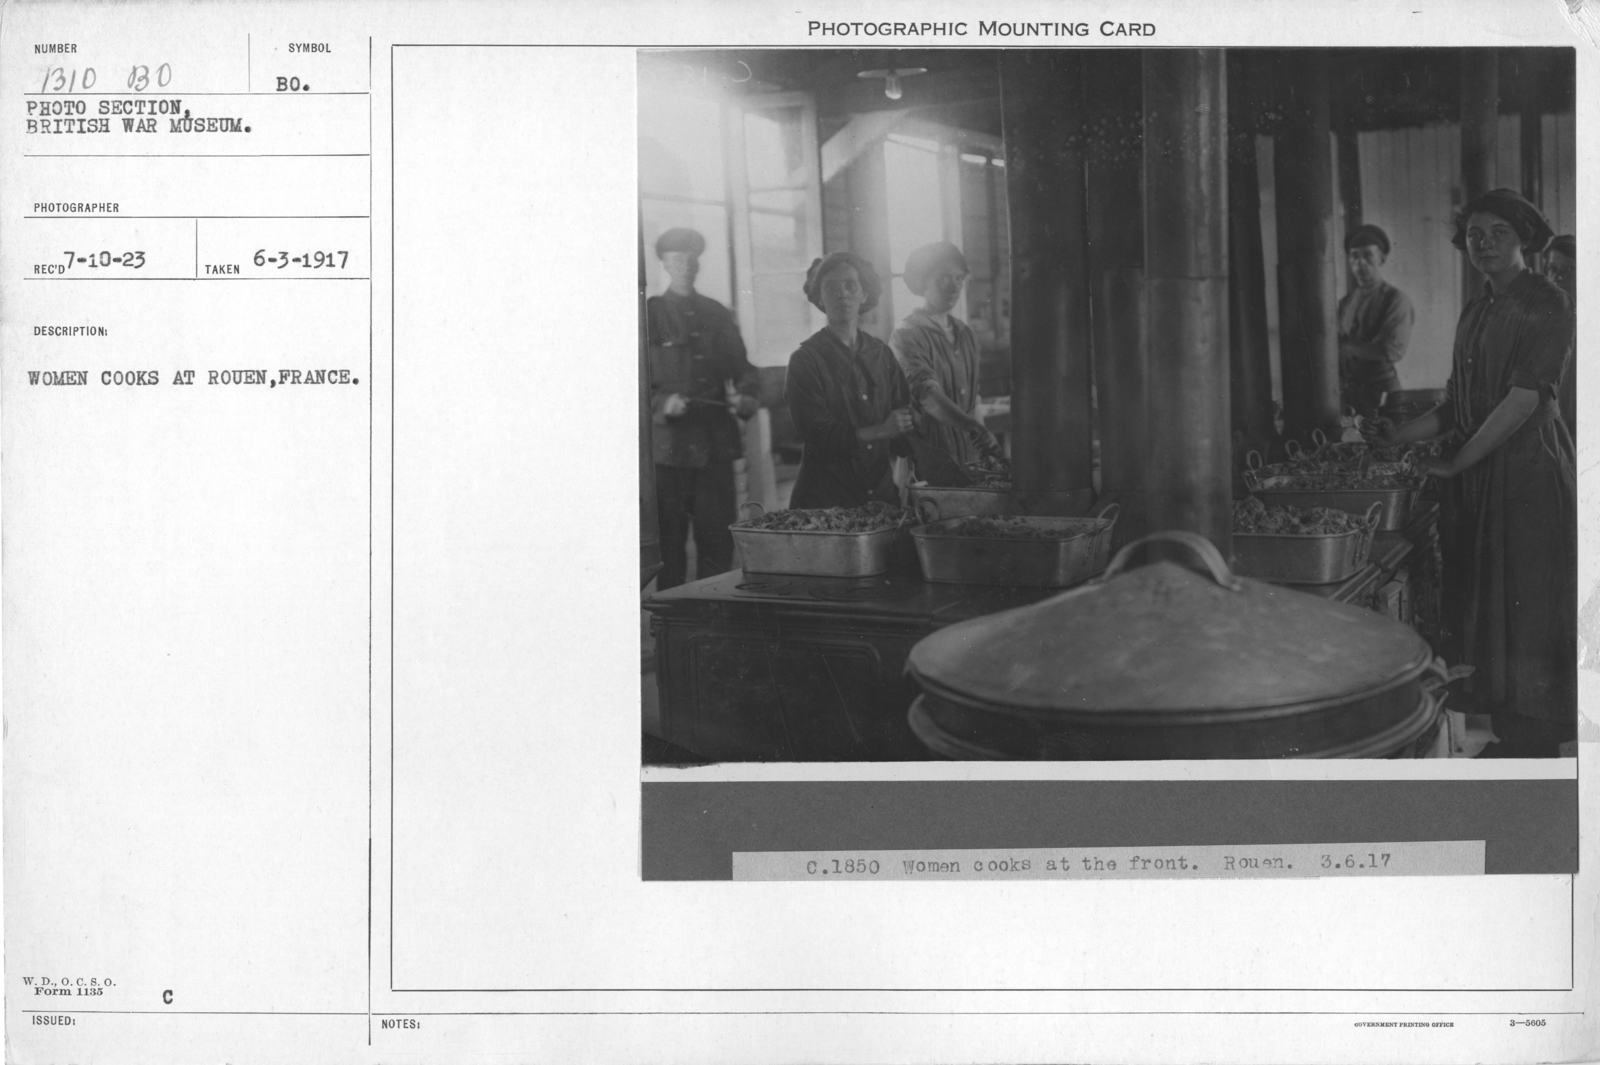 Women cooks at Rouen, France. 6-3-1917